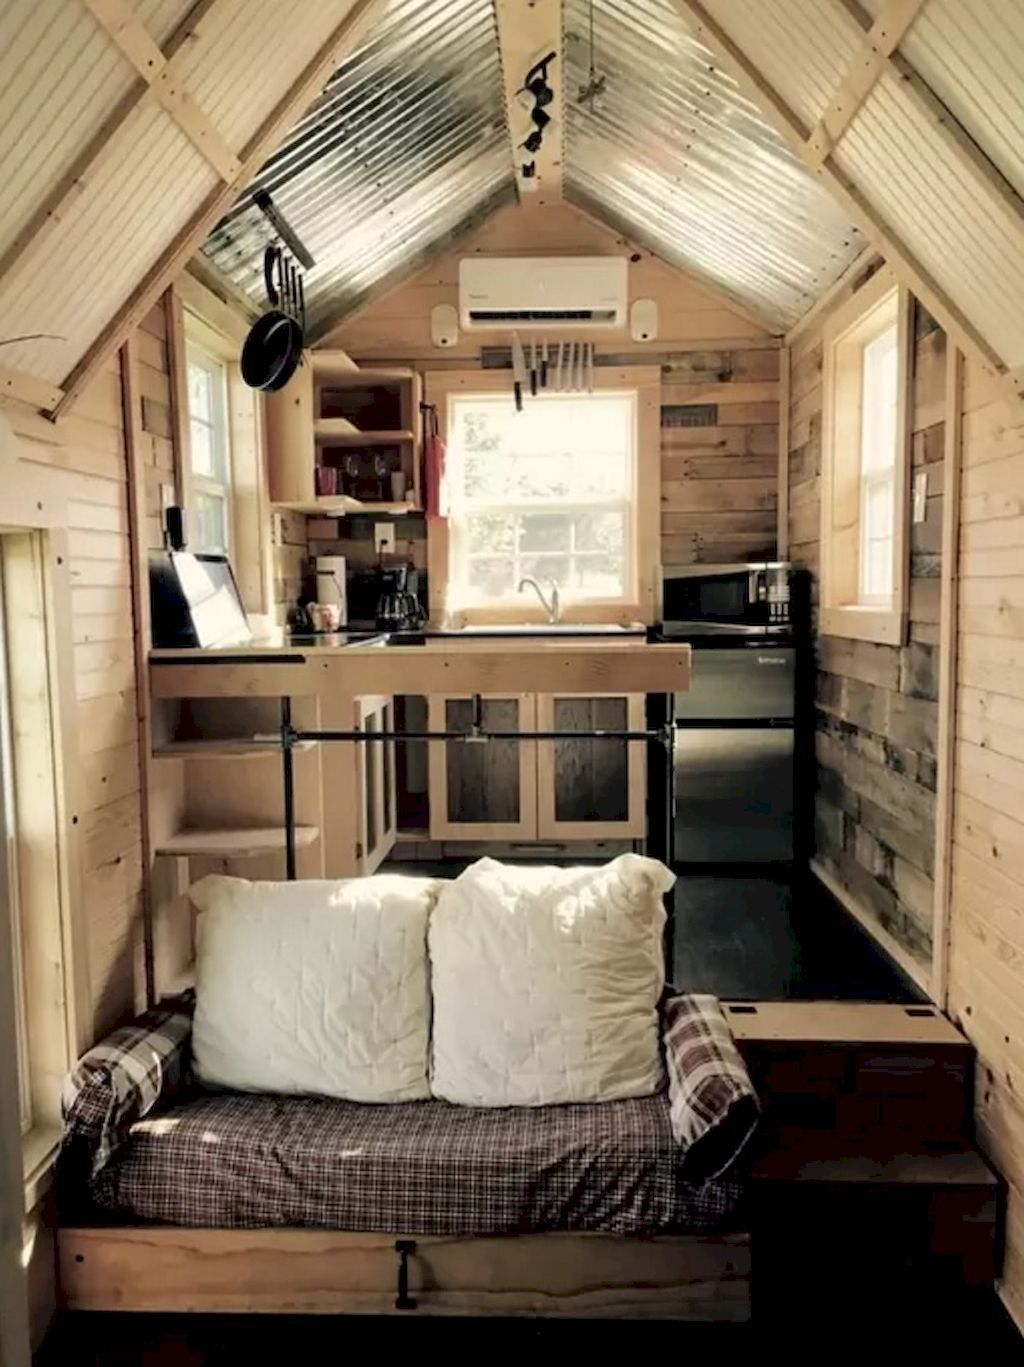 gorgeous 40 tiny house kitchen design ideas https crowdecor com 40 rh pinterest com 40' tiny house for sale 40' tiny house